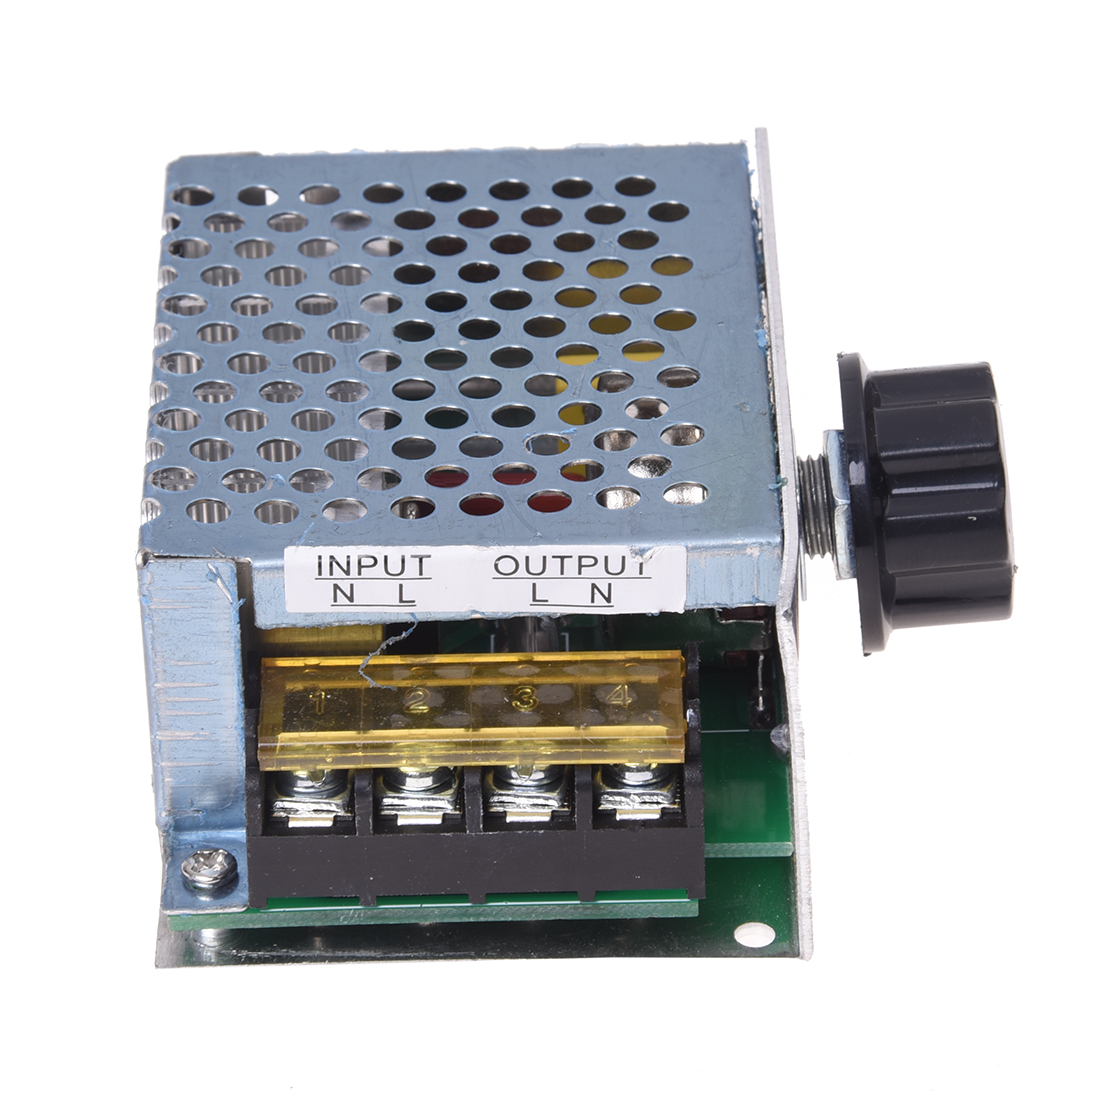 Voltage Regulator Adjust Motor Speed Control Dimmer Thermostat AC 220V 4000W New